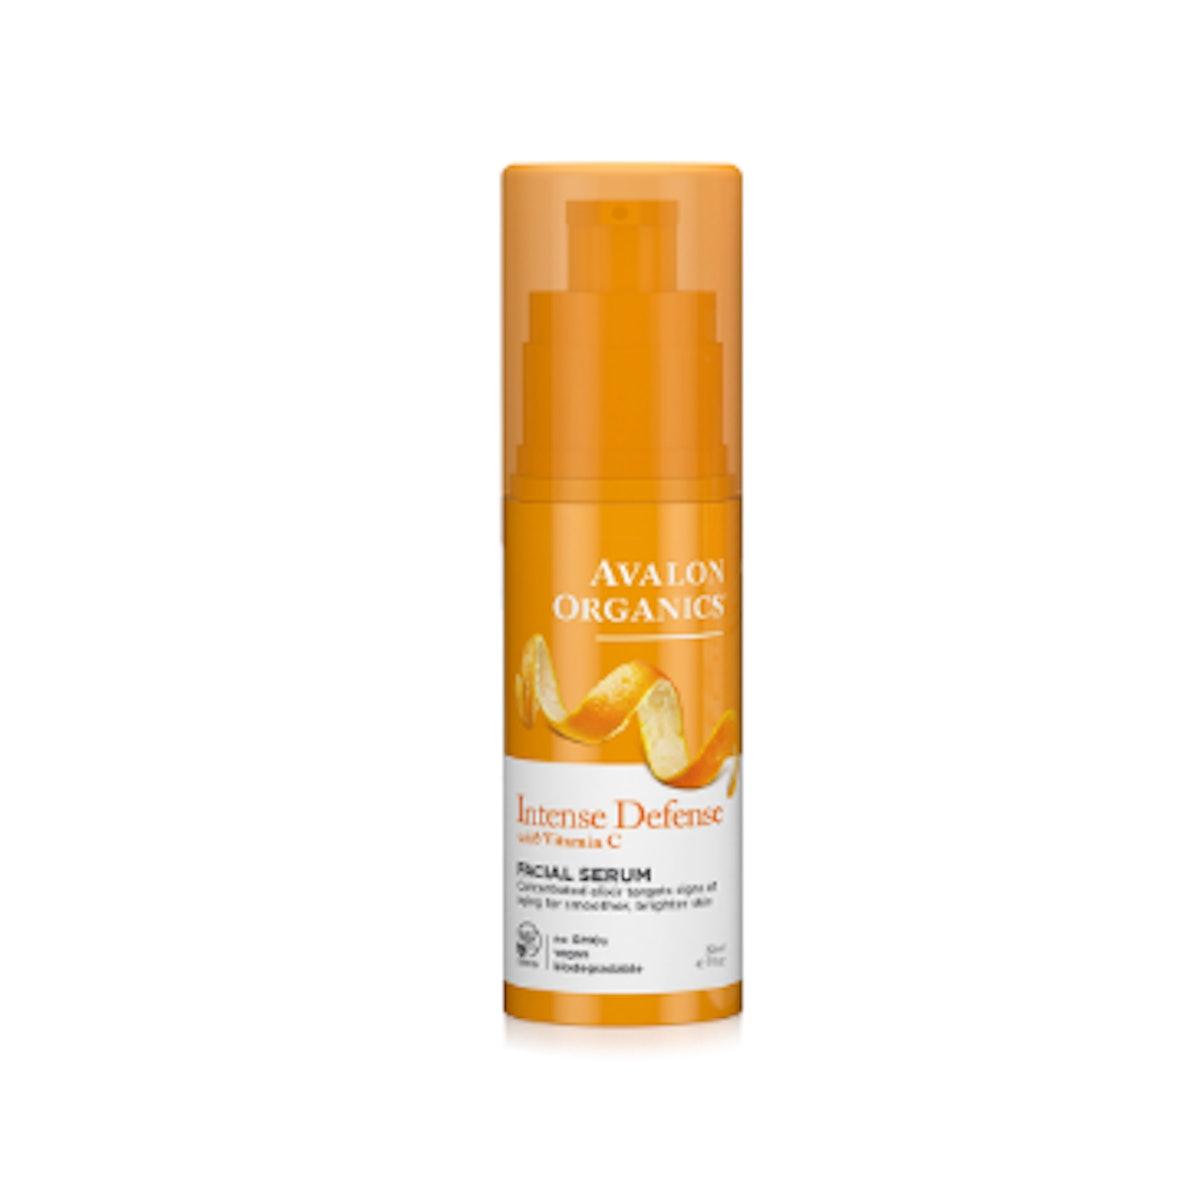 Avalon Organics Vitamin C Renewal Vitality Facial Serum, 1 Oz